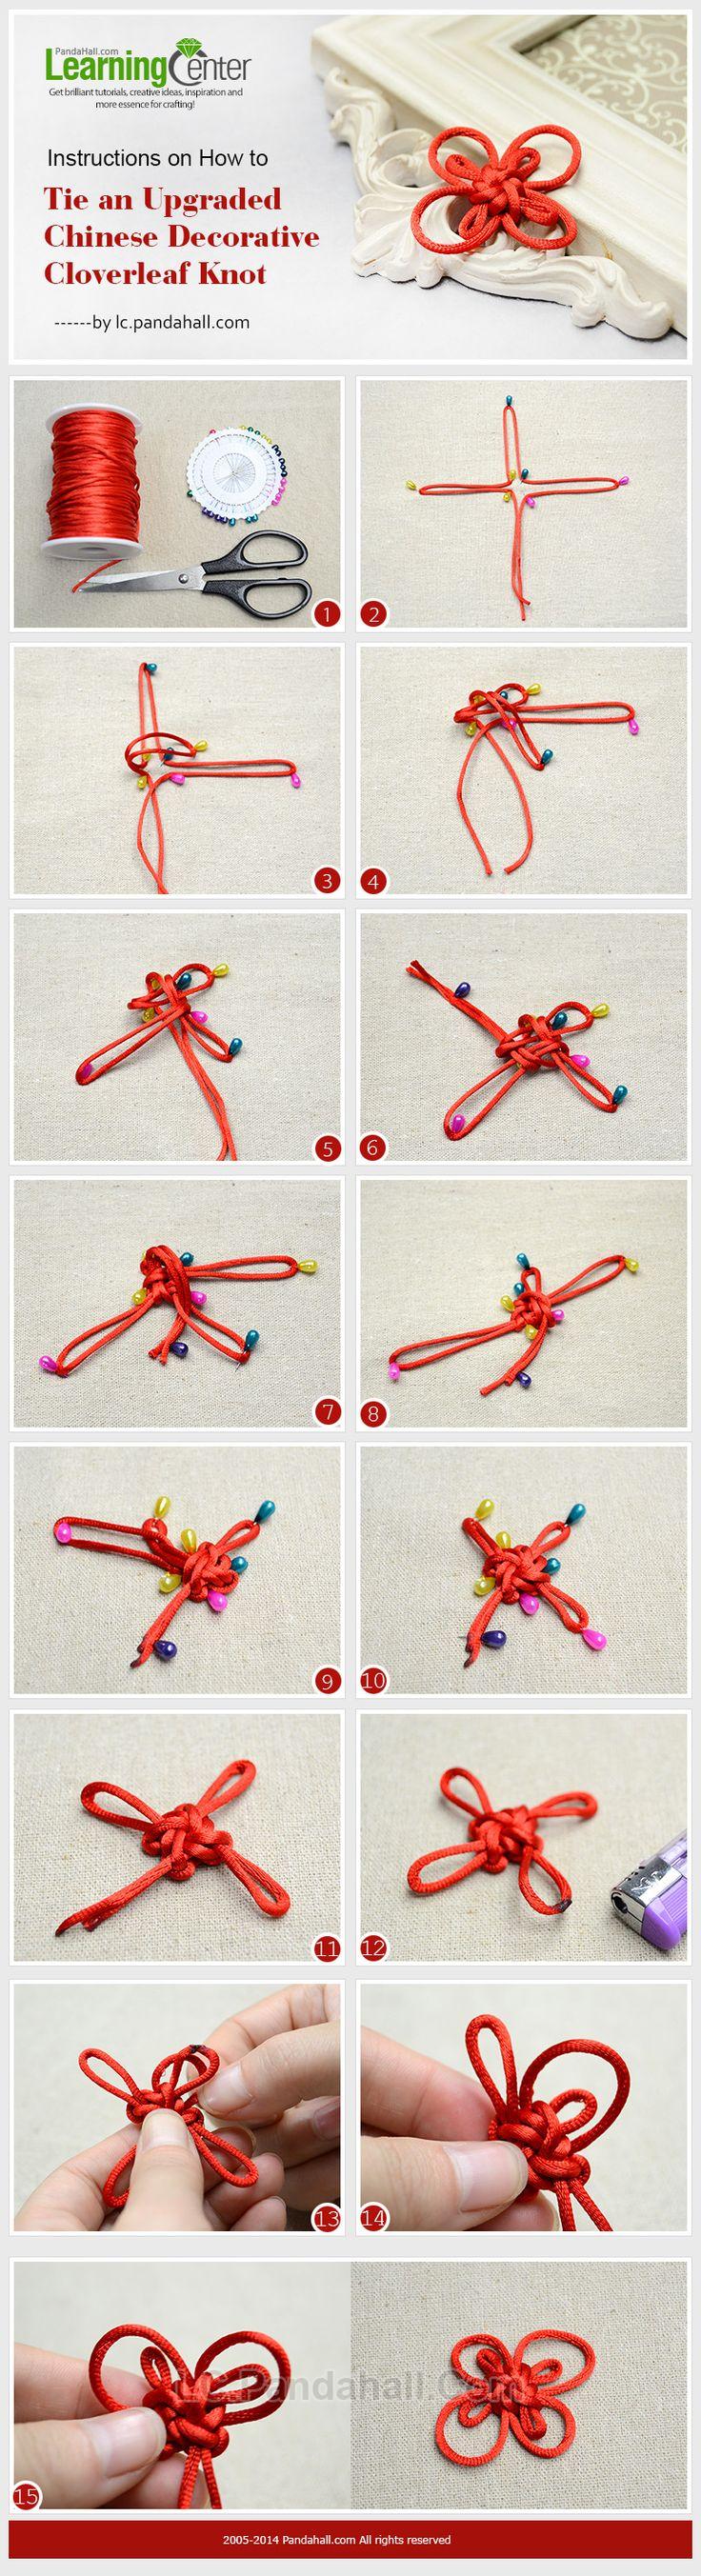 decorative knots instructions - 736×2705